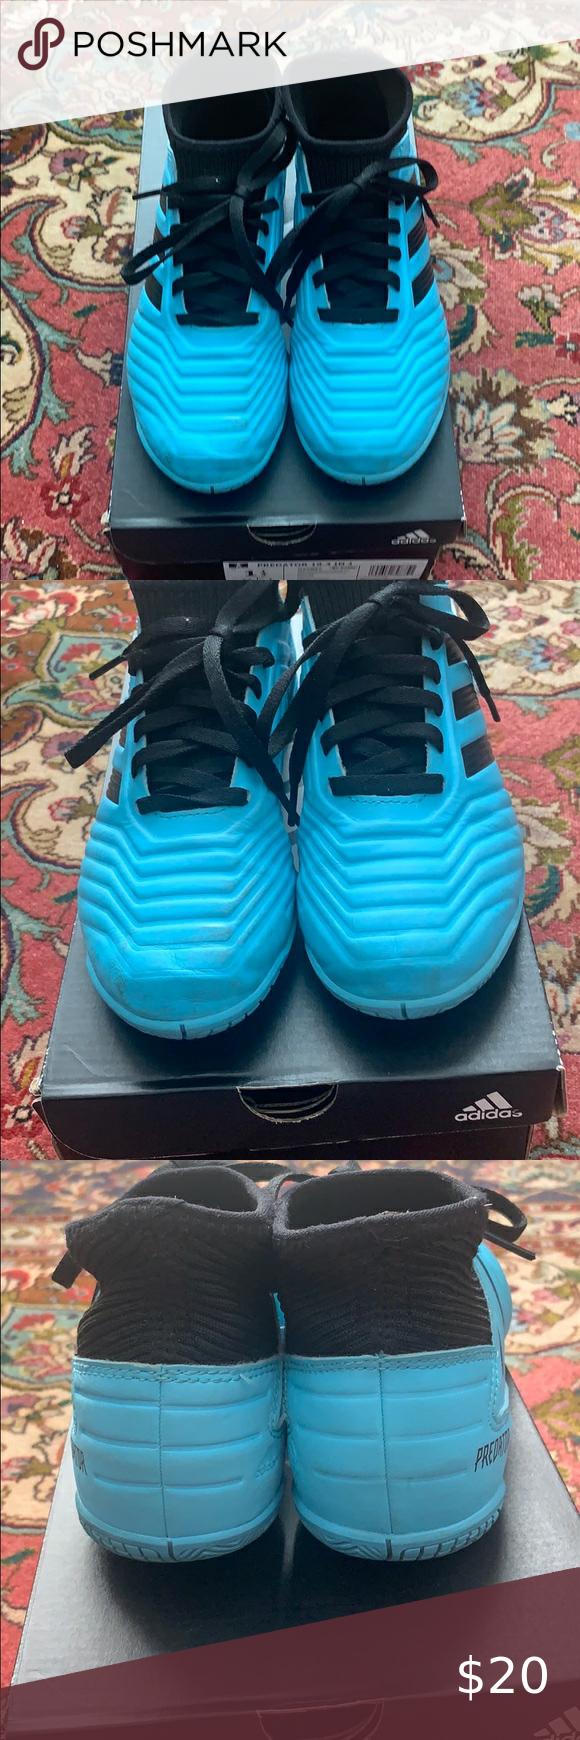 Adidas Predator 19 3 In J Kids Indoor Soccer Shoes In 2020 Soccer Shoes Me Too Shoes Shoes